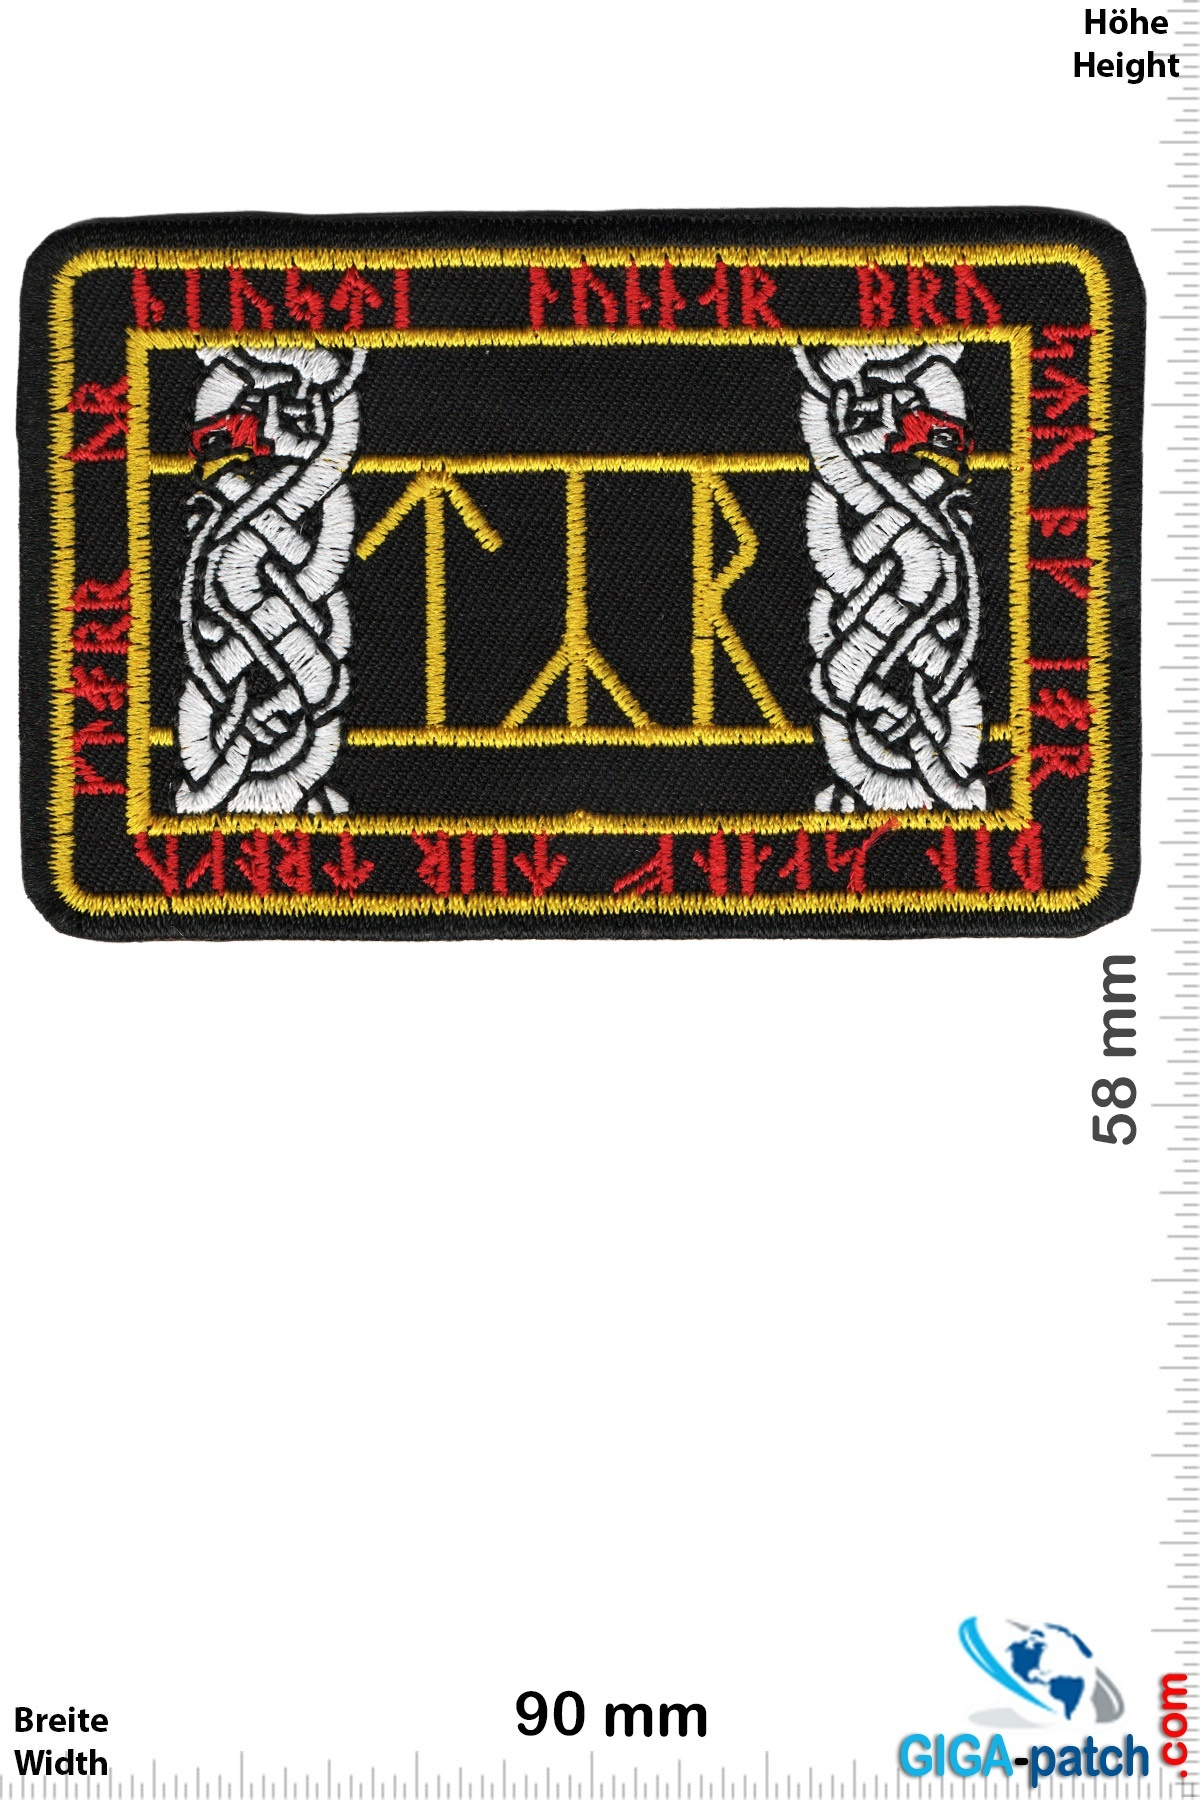 Týr - Metal-Band  - Tyr - Celtic Rune